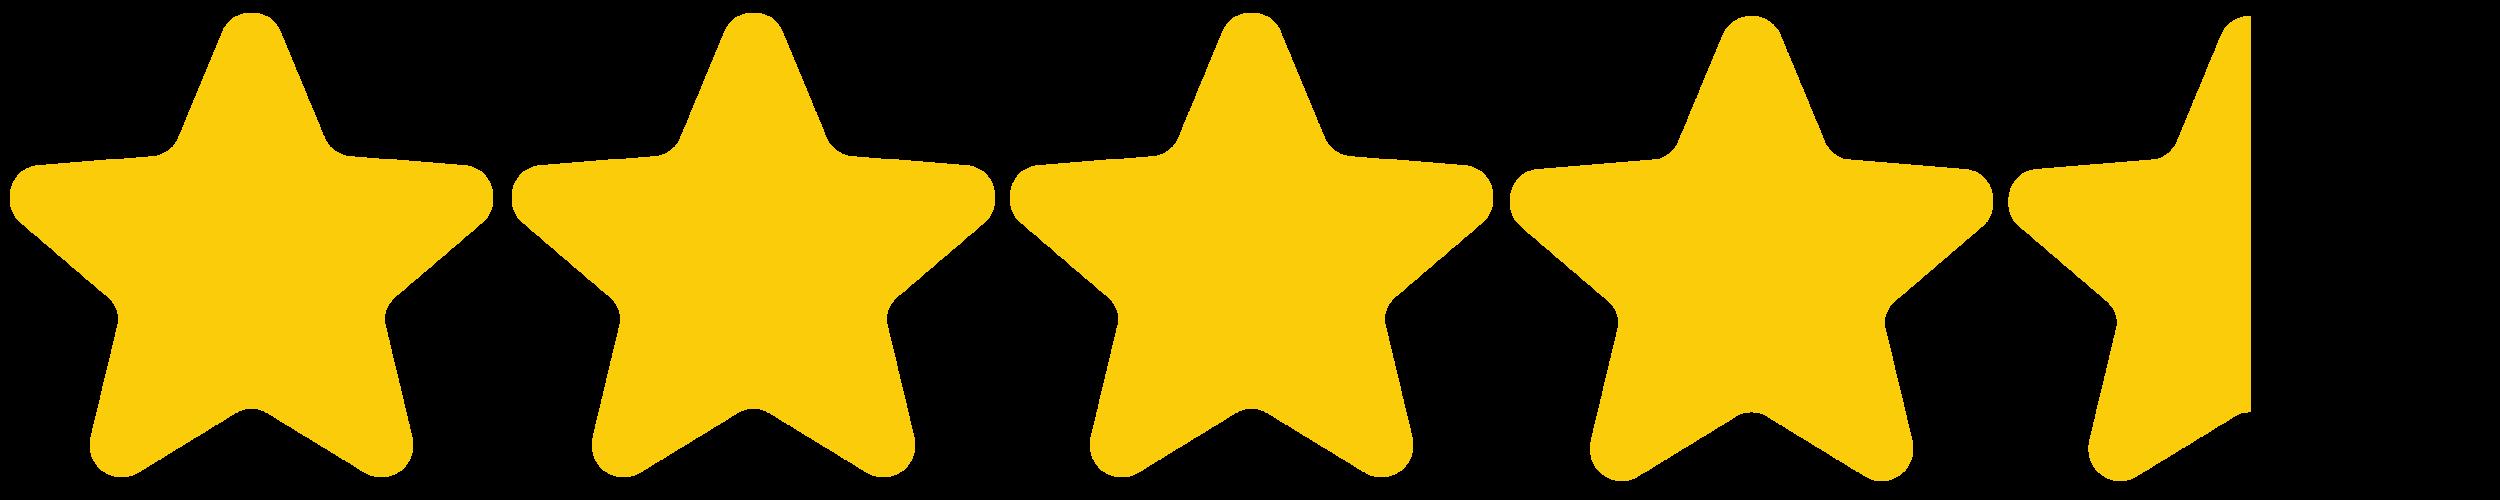 - (4.5 stars)